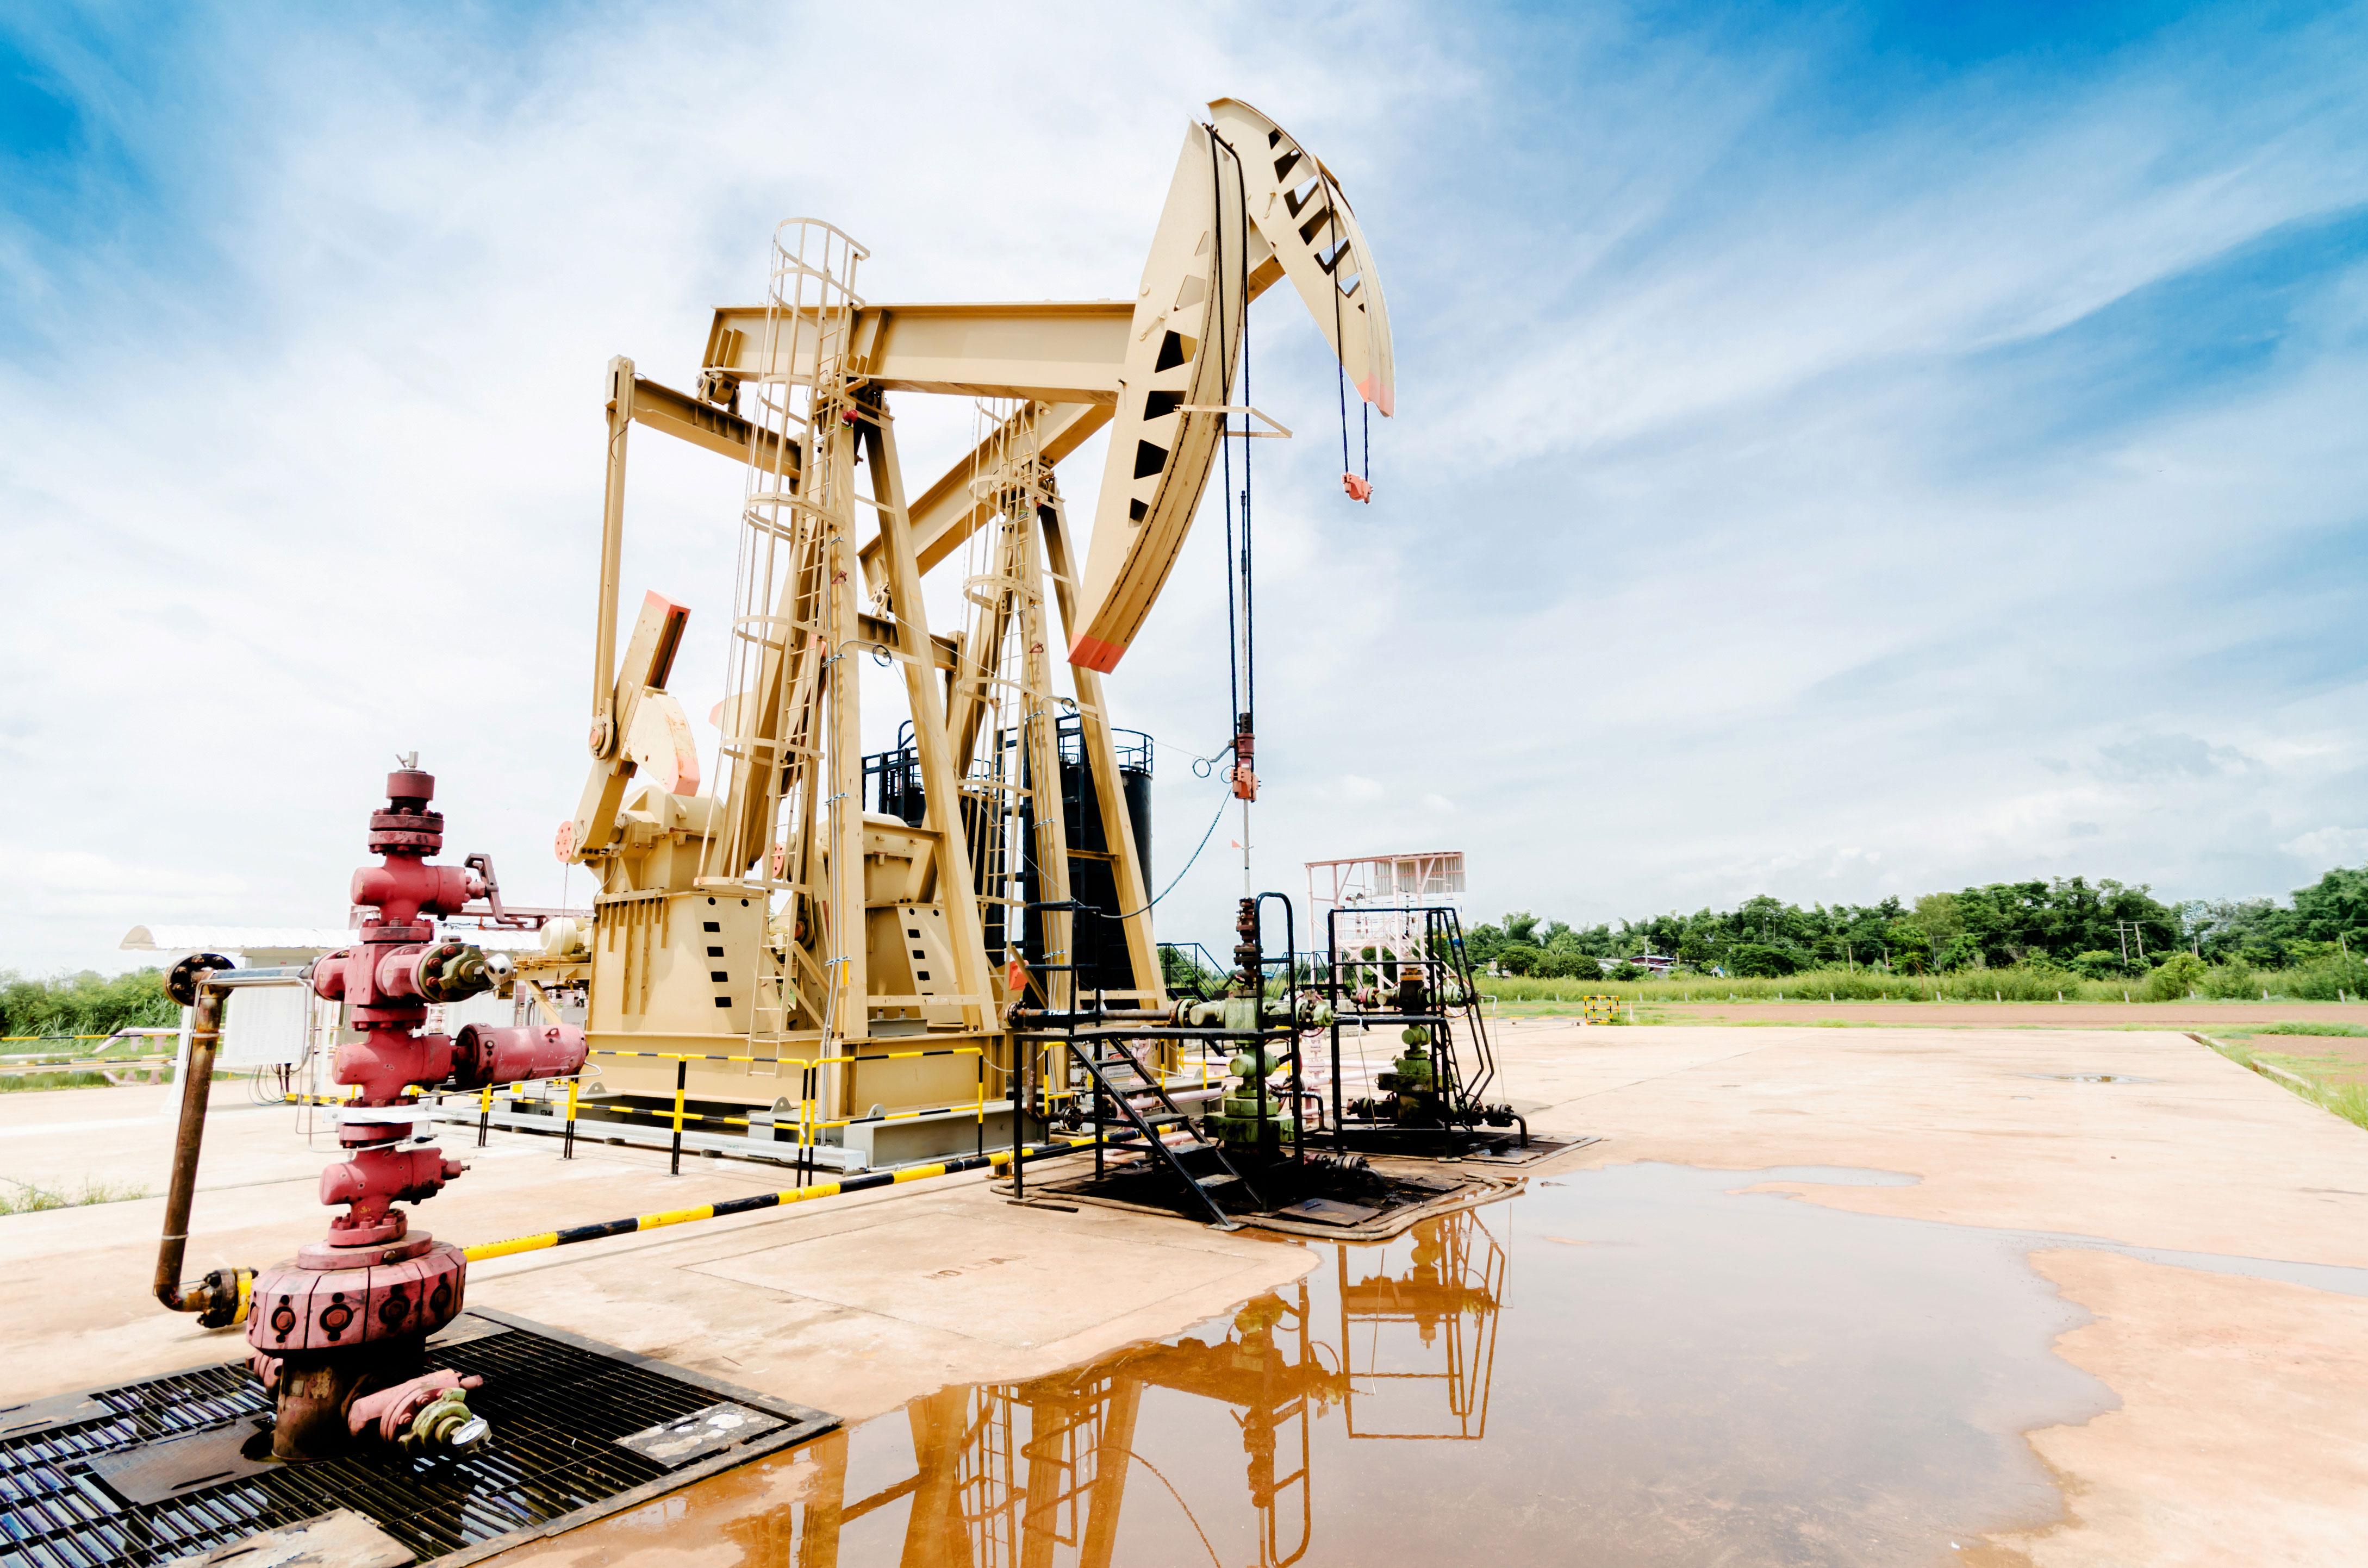 Ölborung an Land vor blauem Himmel